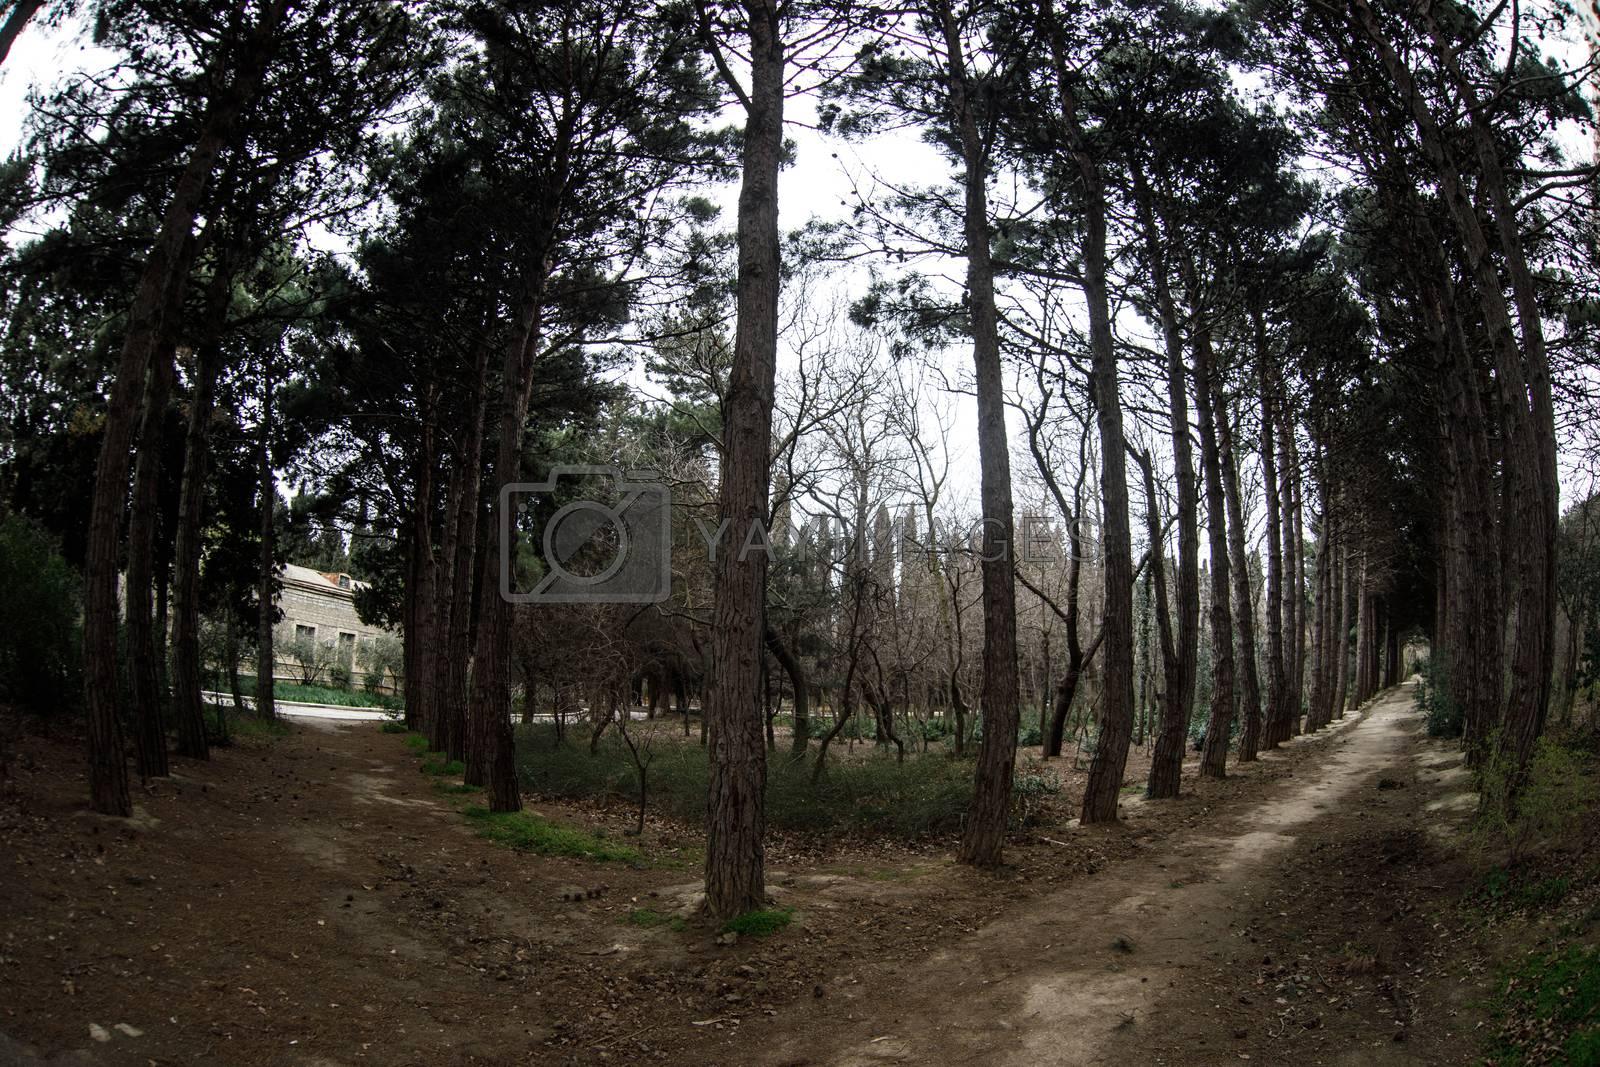 Fisheye view of dense pine tree forest looking up. Cloudy weather. Early spring time. Baku, Botanical garden. Azerbaijan